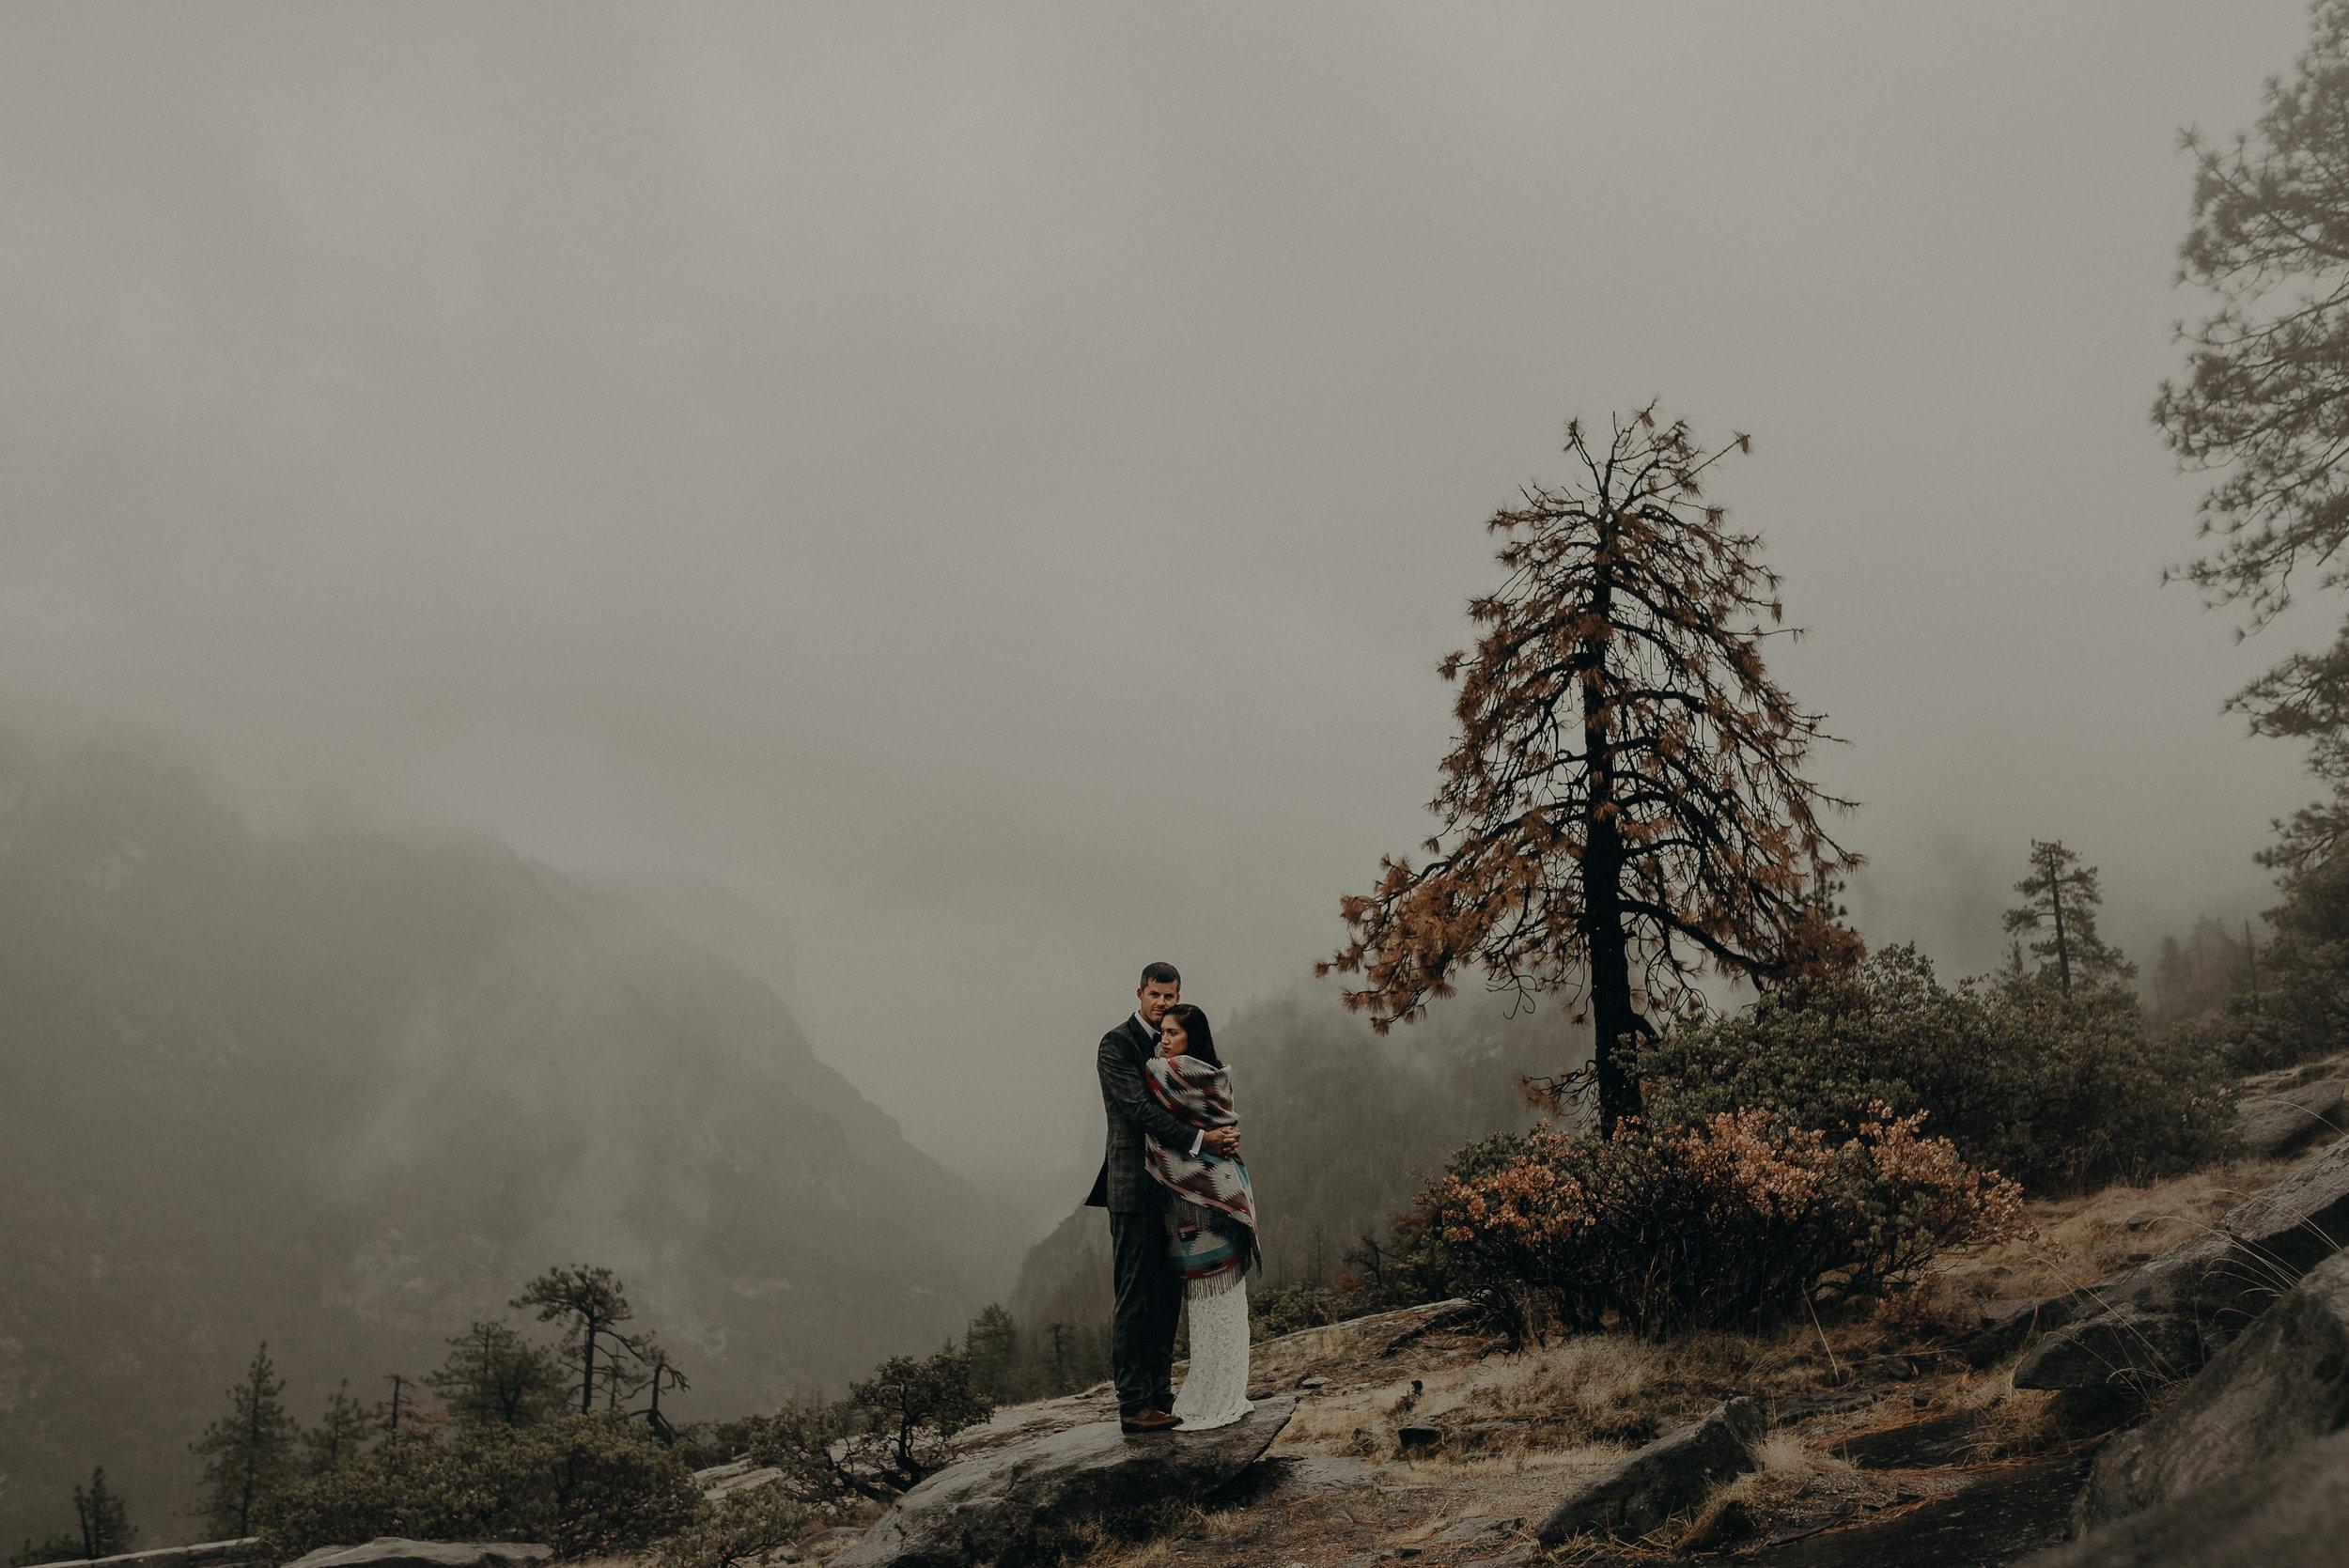 Isaiah + Taylor Photography - Yosemite Elopement - Los Angeles Wedding Photographer-43.jpg